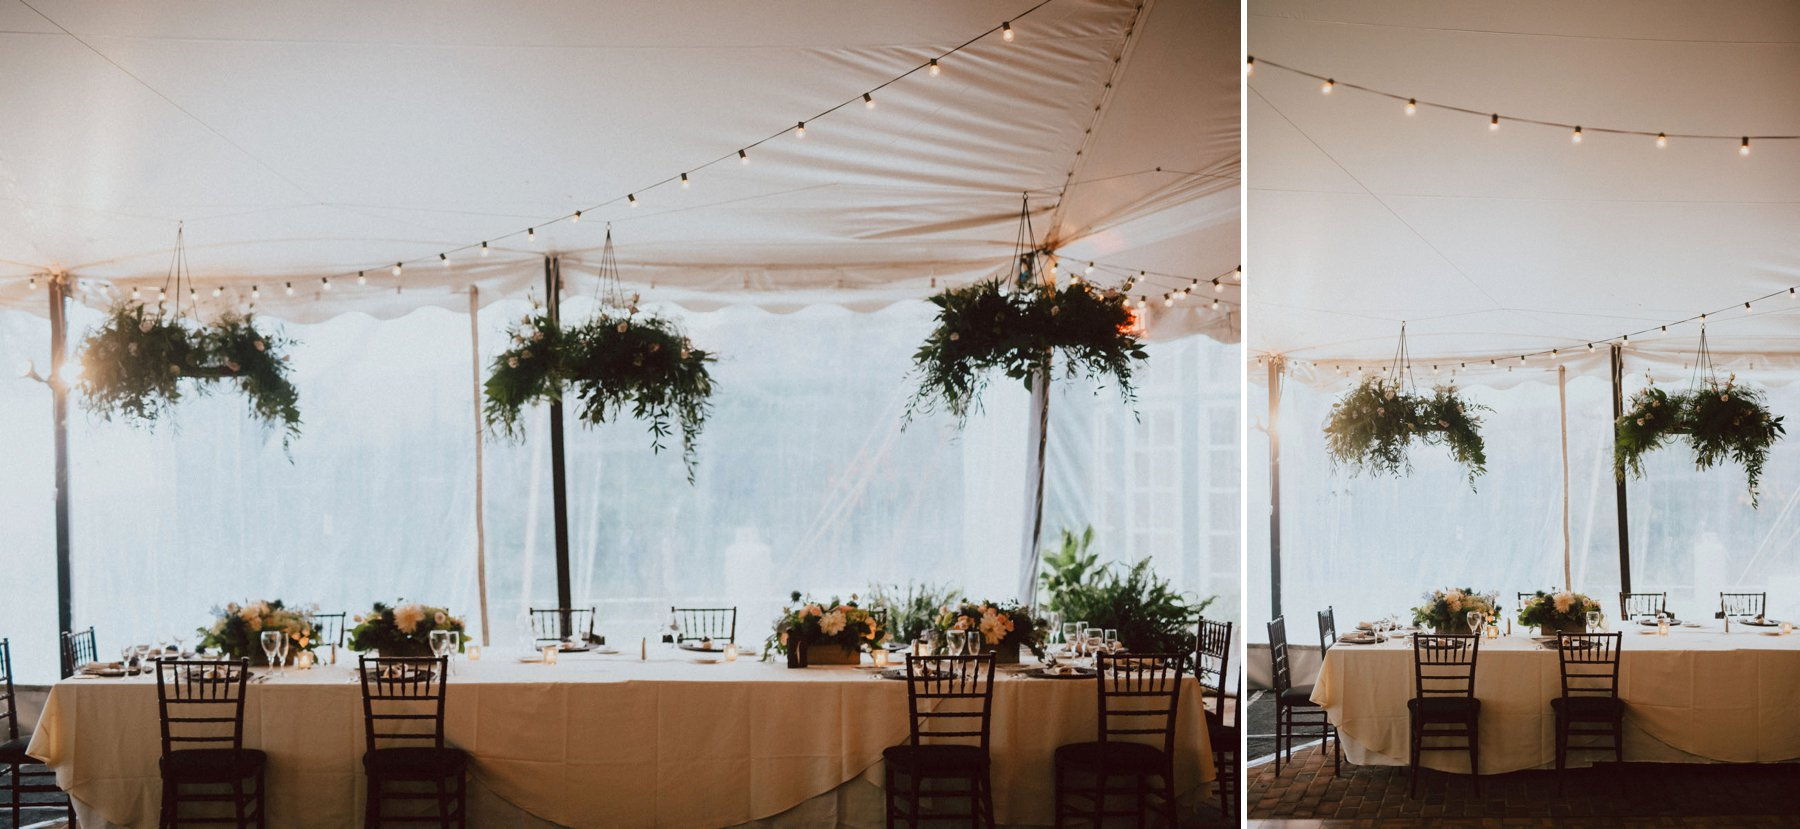 greenville-country-club-wedding-118.jpg